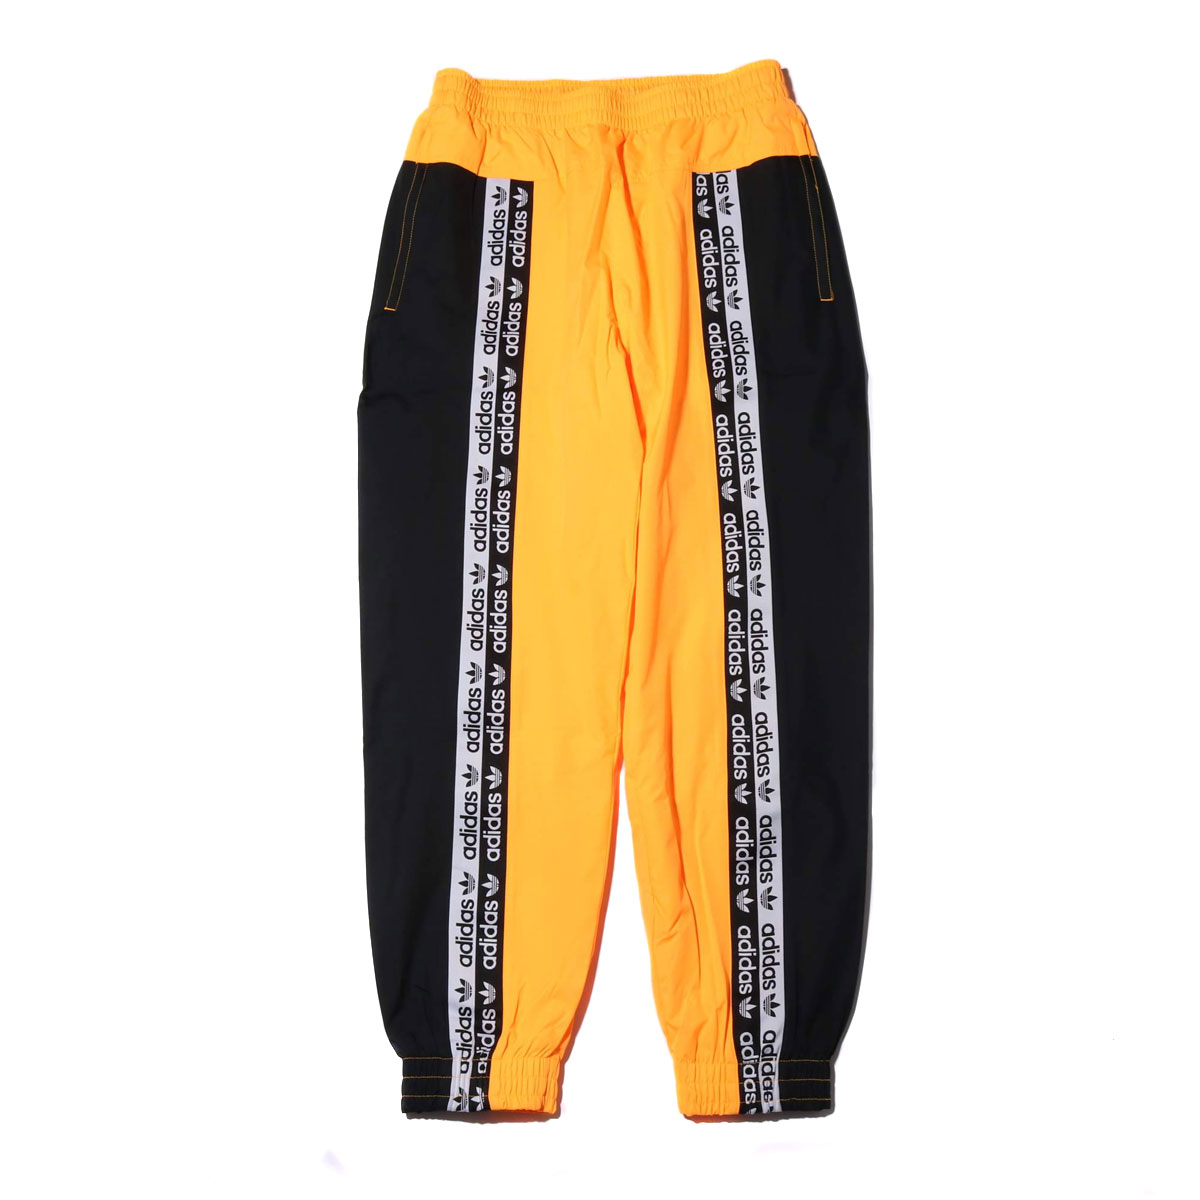 adidas R.Y.V. WIND TRACK PANTS(アディダス R.Y.V. ウインド トラック パンツ)FLASH ORANGE【メンズ パンツ】19FW-I